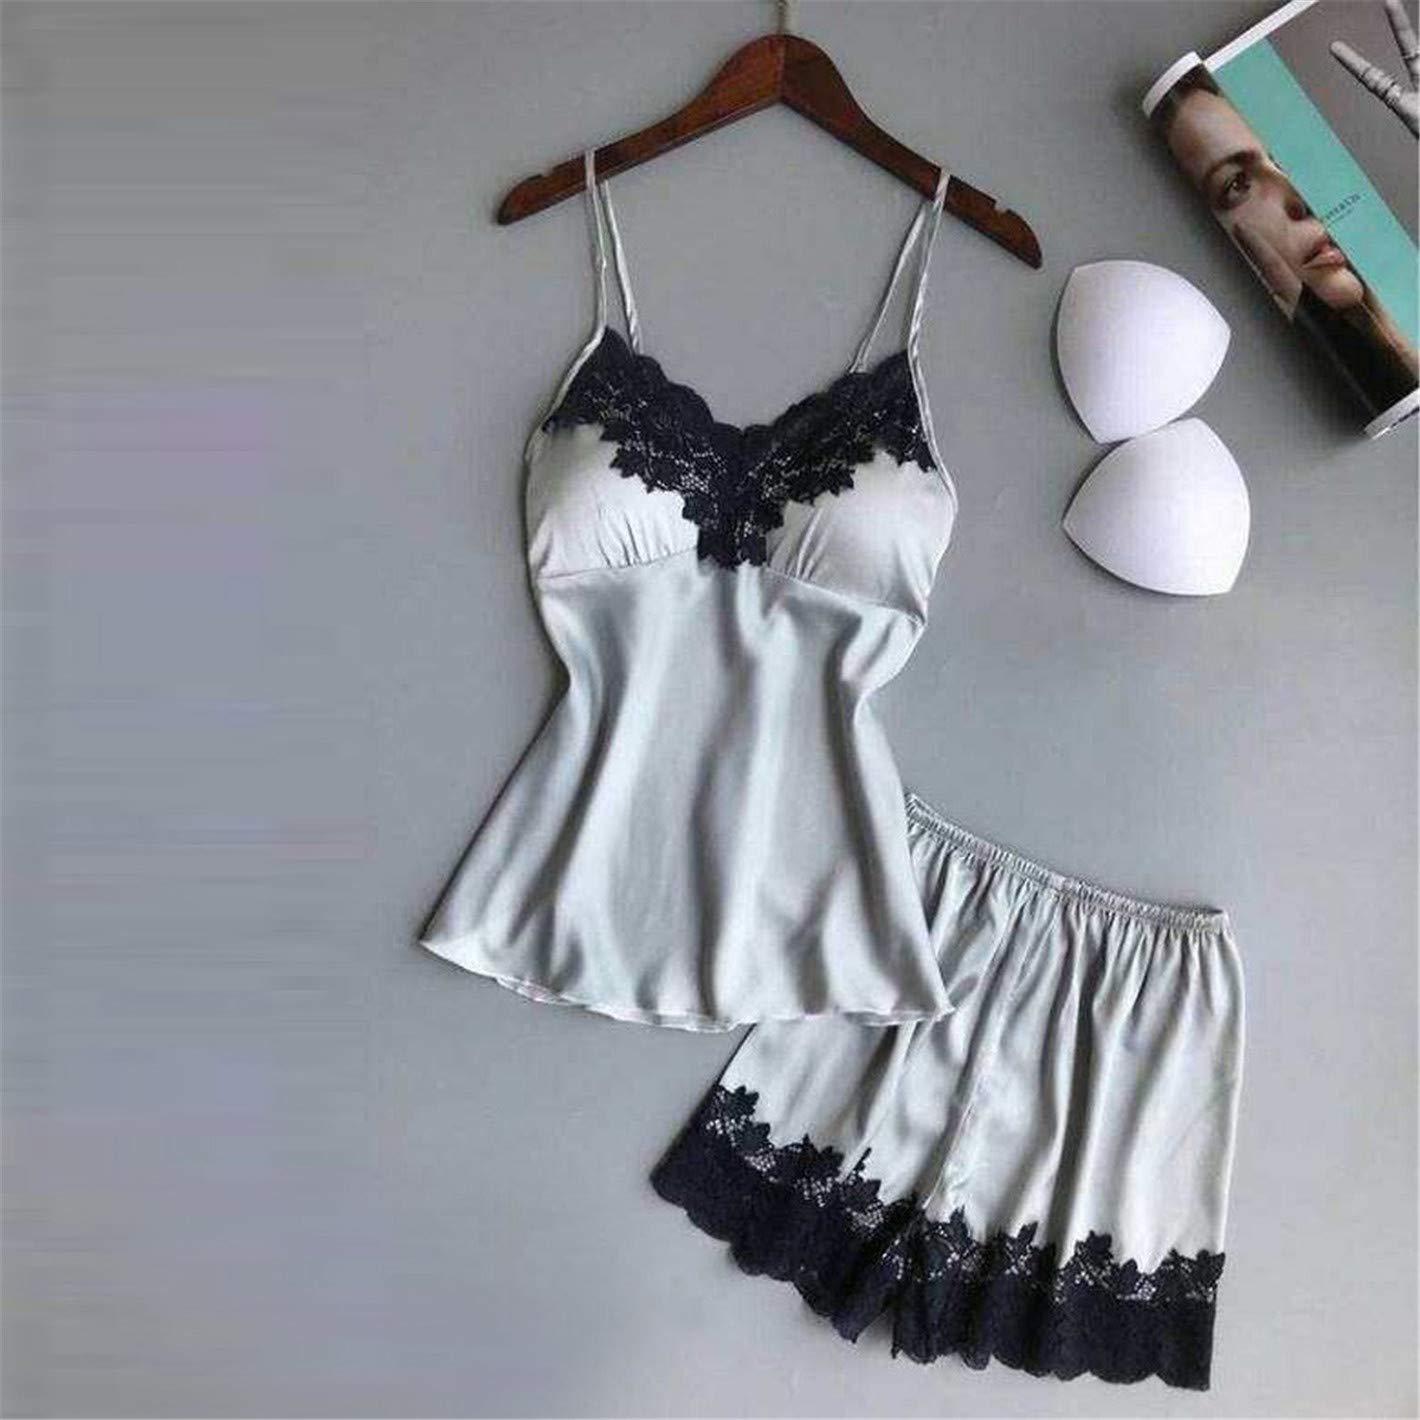 TIFENNY Women's Fashion Sexy Sling Lace Sleepwear Lingerie Temptation Underwear Jumpsuit 2019 New Soft Pajama Silver by TIFENNY_Shirts (Image #2)